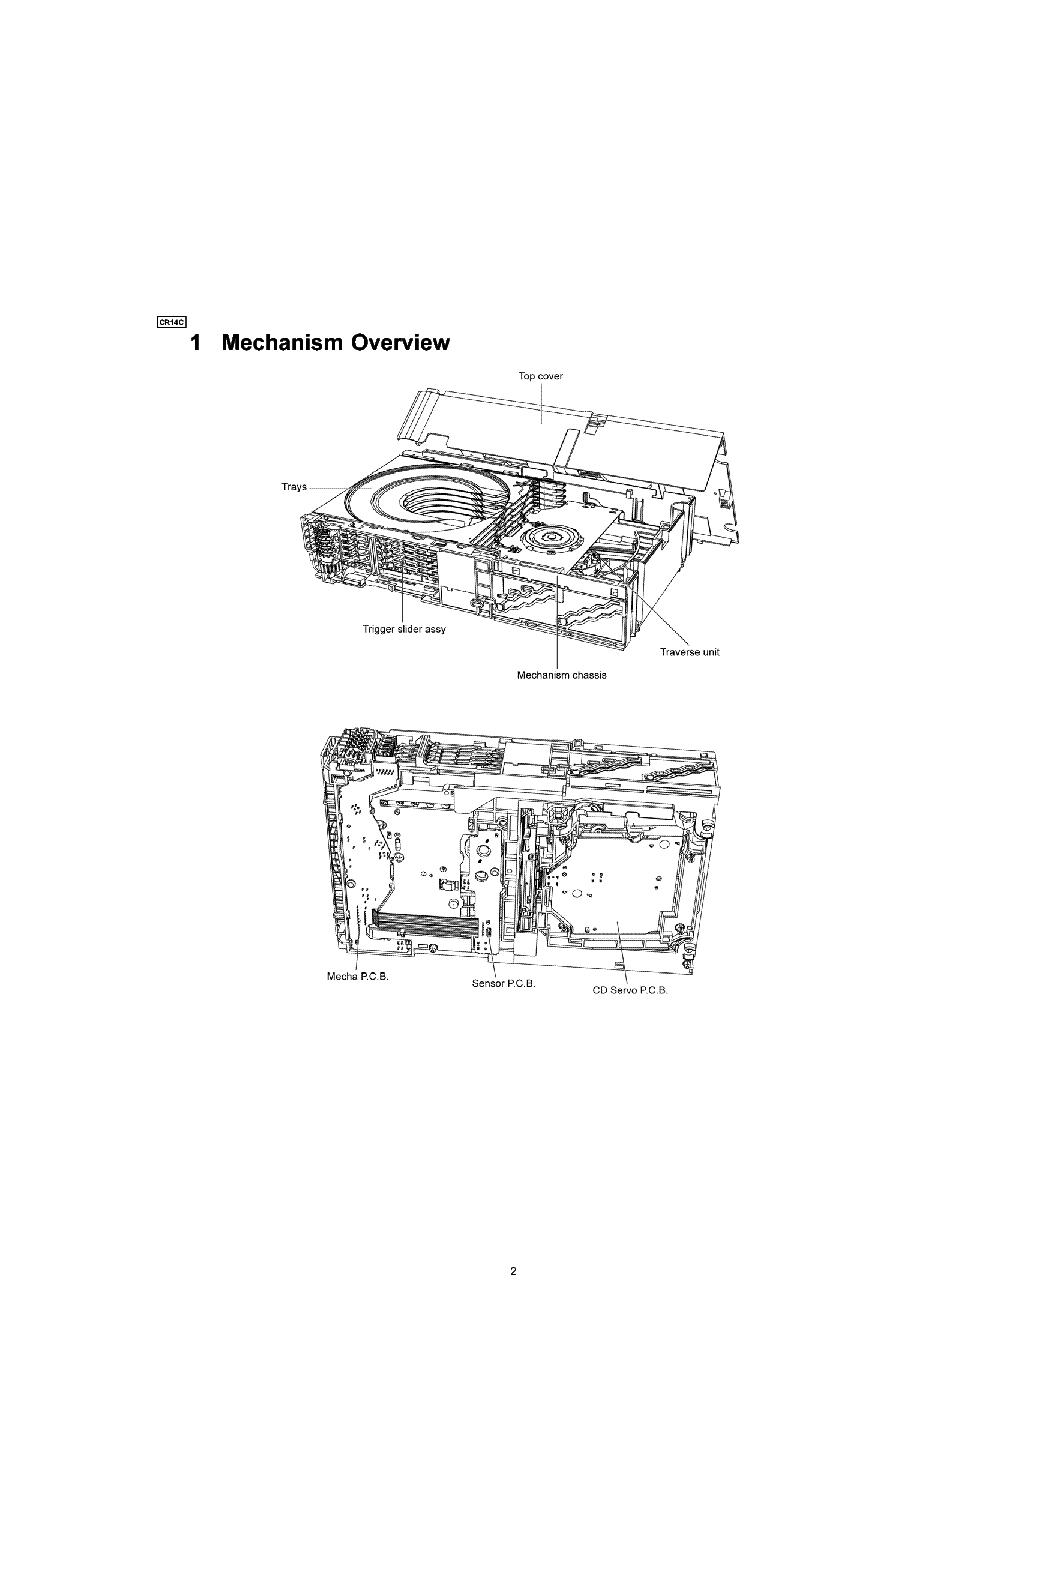 Panasonic Cr14c Cd Changer Mechanism Unit Sm Service Manual Download  Schematics  Eeprom  Repair